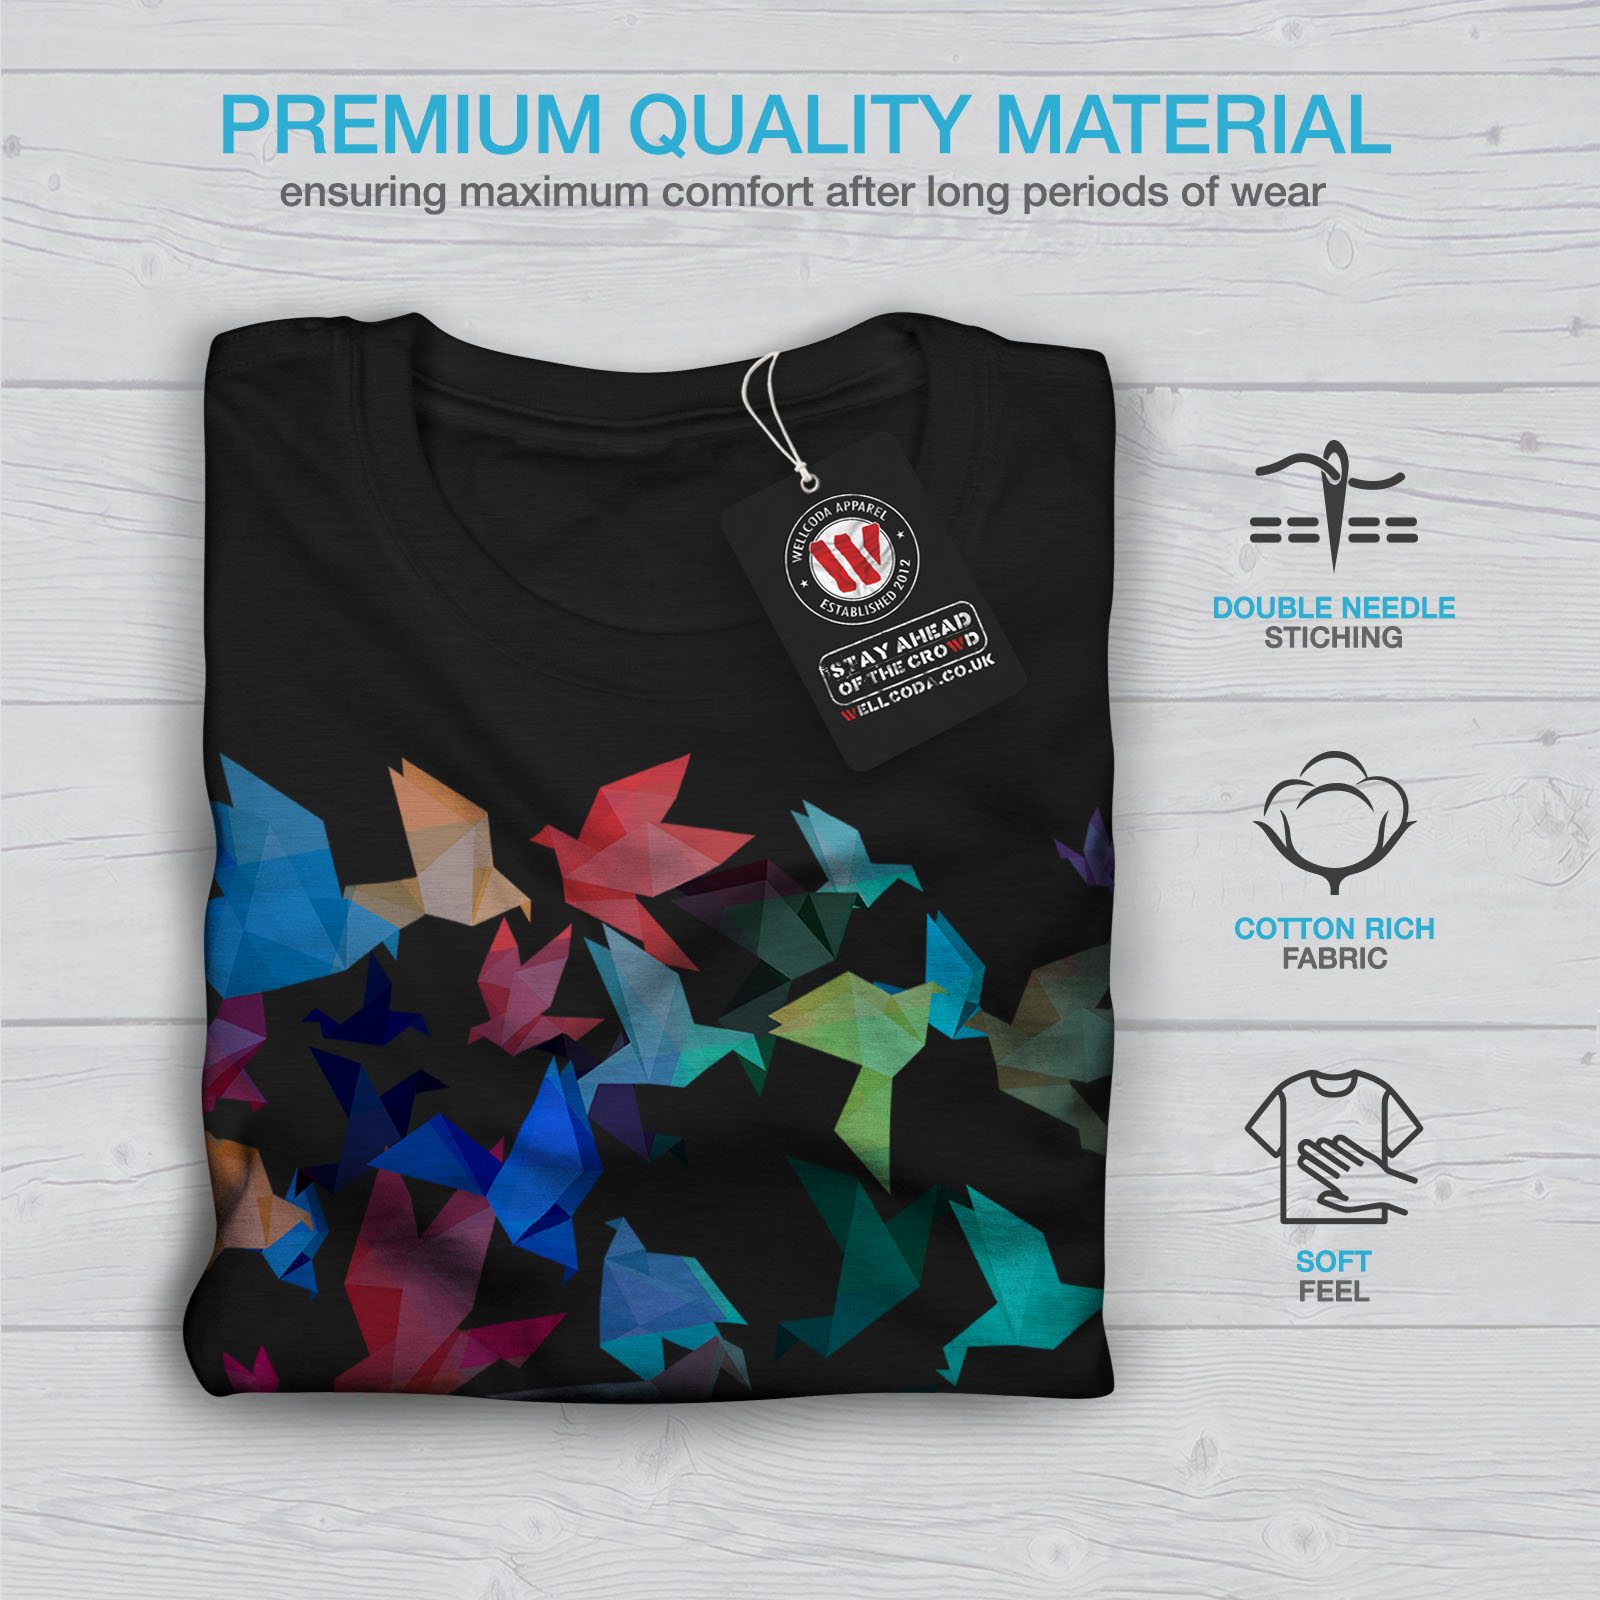 Wellcoda-Origami-Bird-Colors-Mens-T-shirt-Craft-Graphic-Design-Printed-Tee thumbnail 7